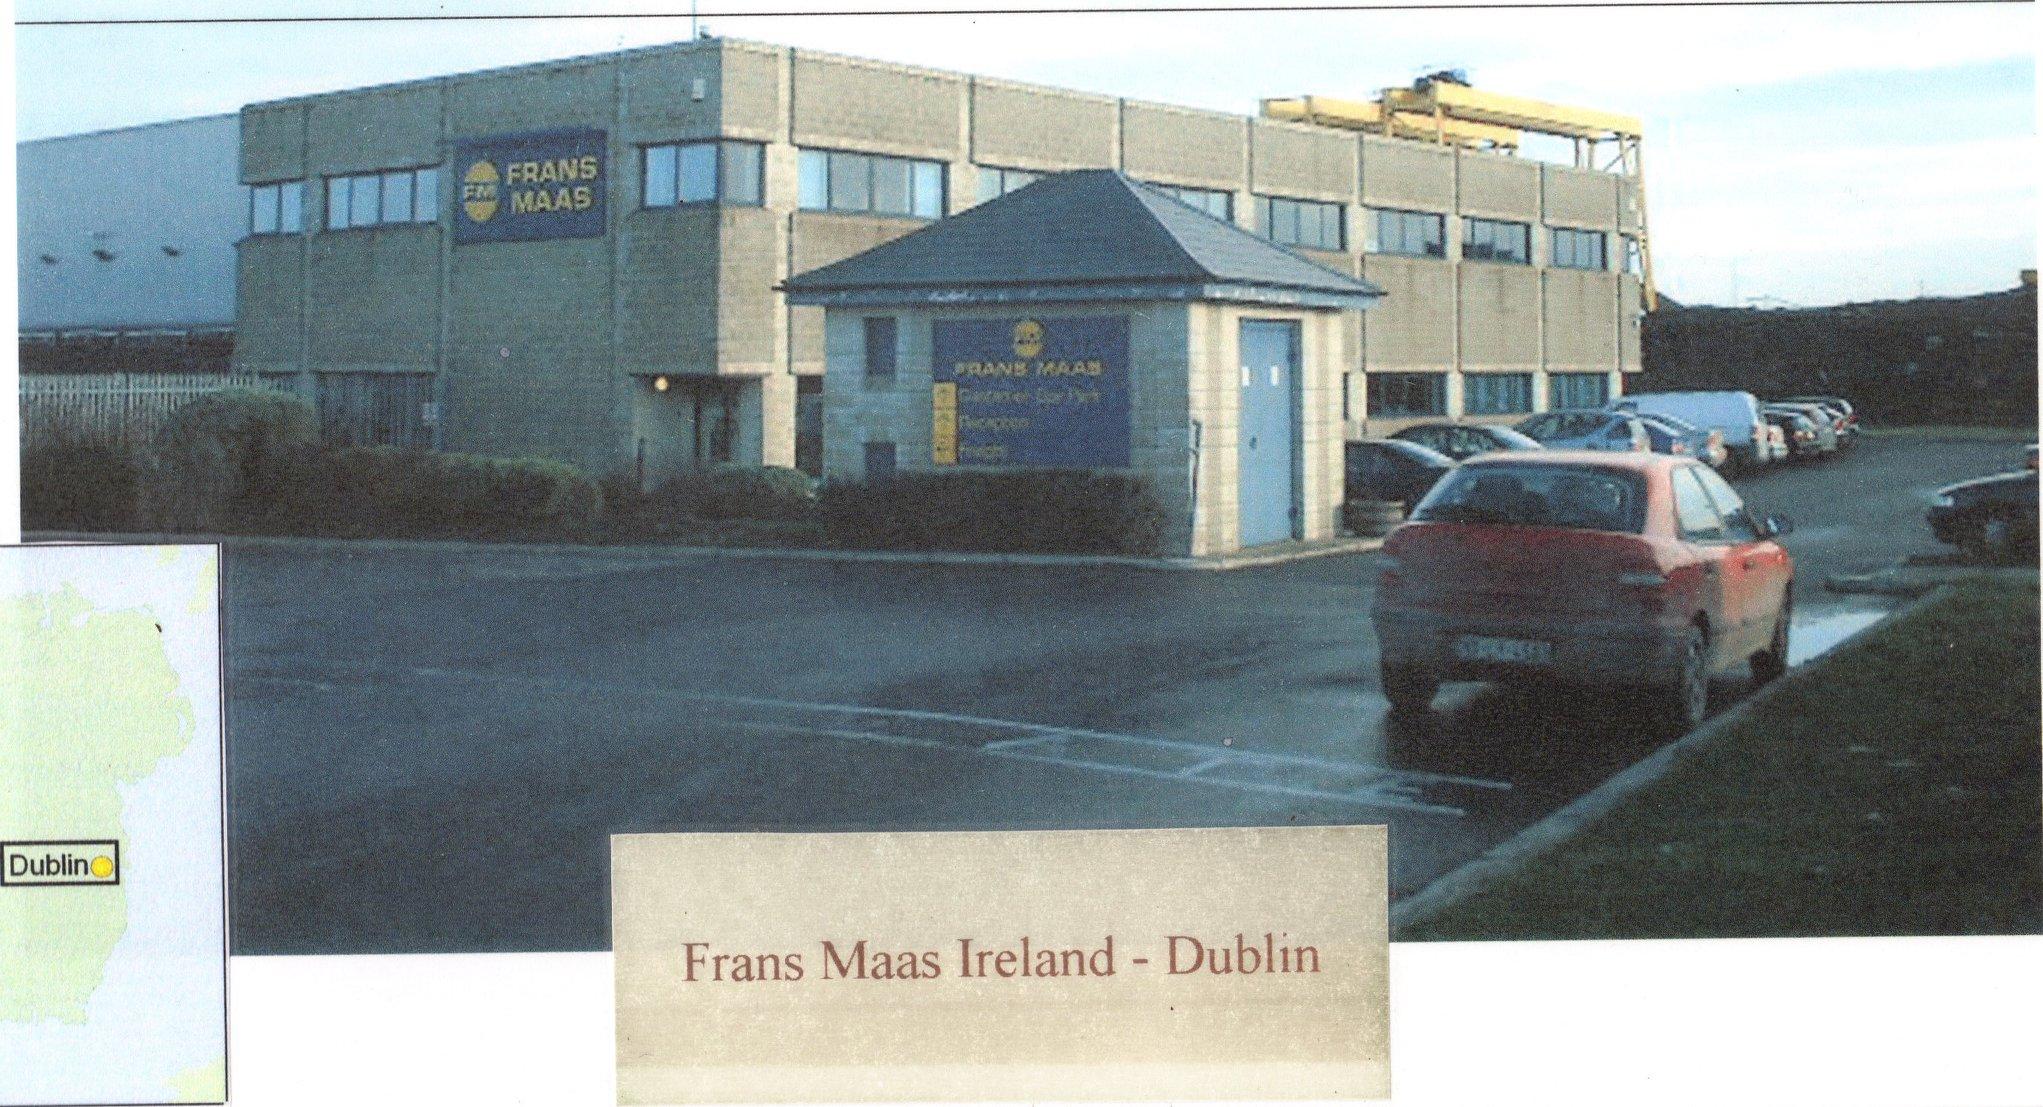 FM-IERLAND